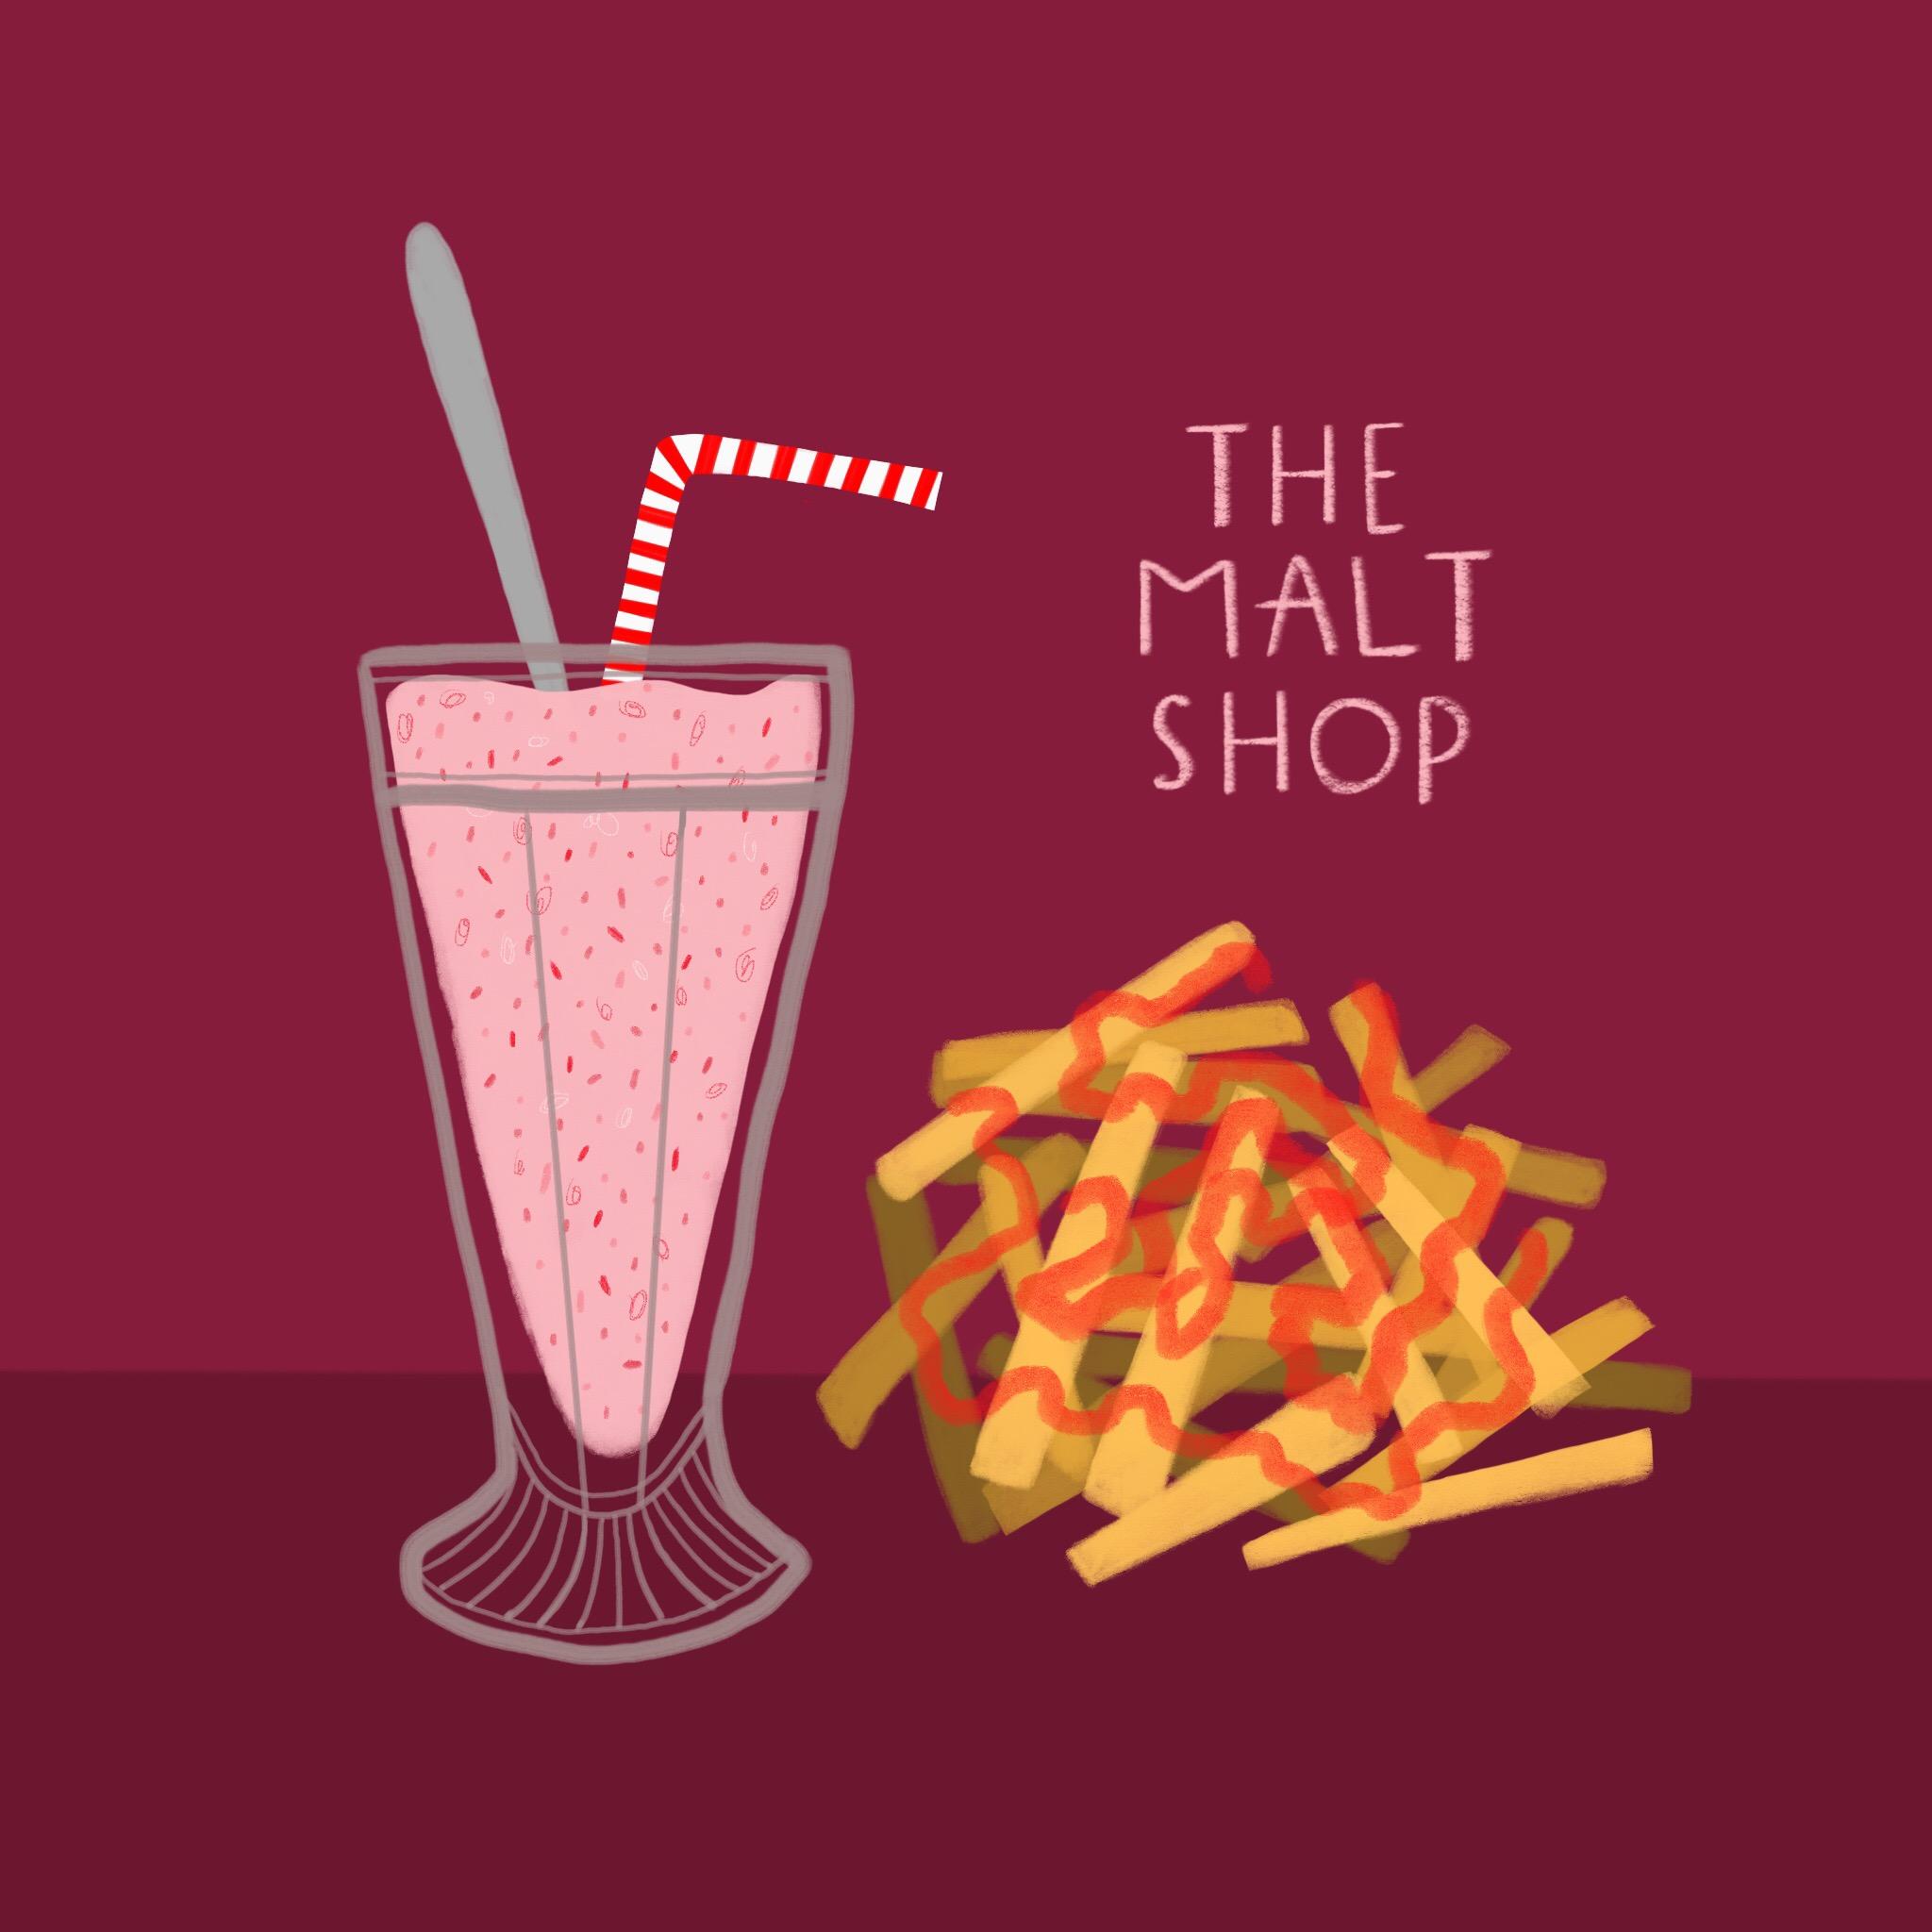 23_-_The_Malt_Shop.jpg